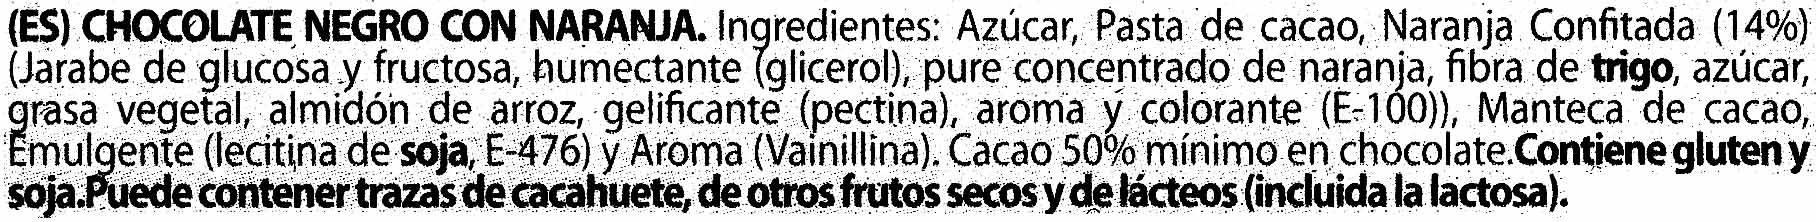 Chocolate negro con naranja 70% cacao - Ingredients